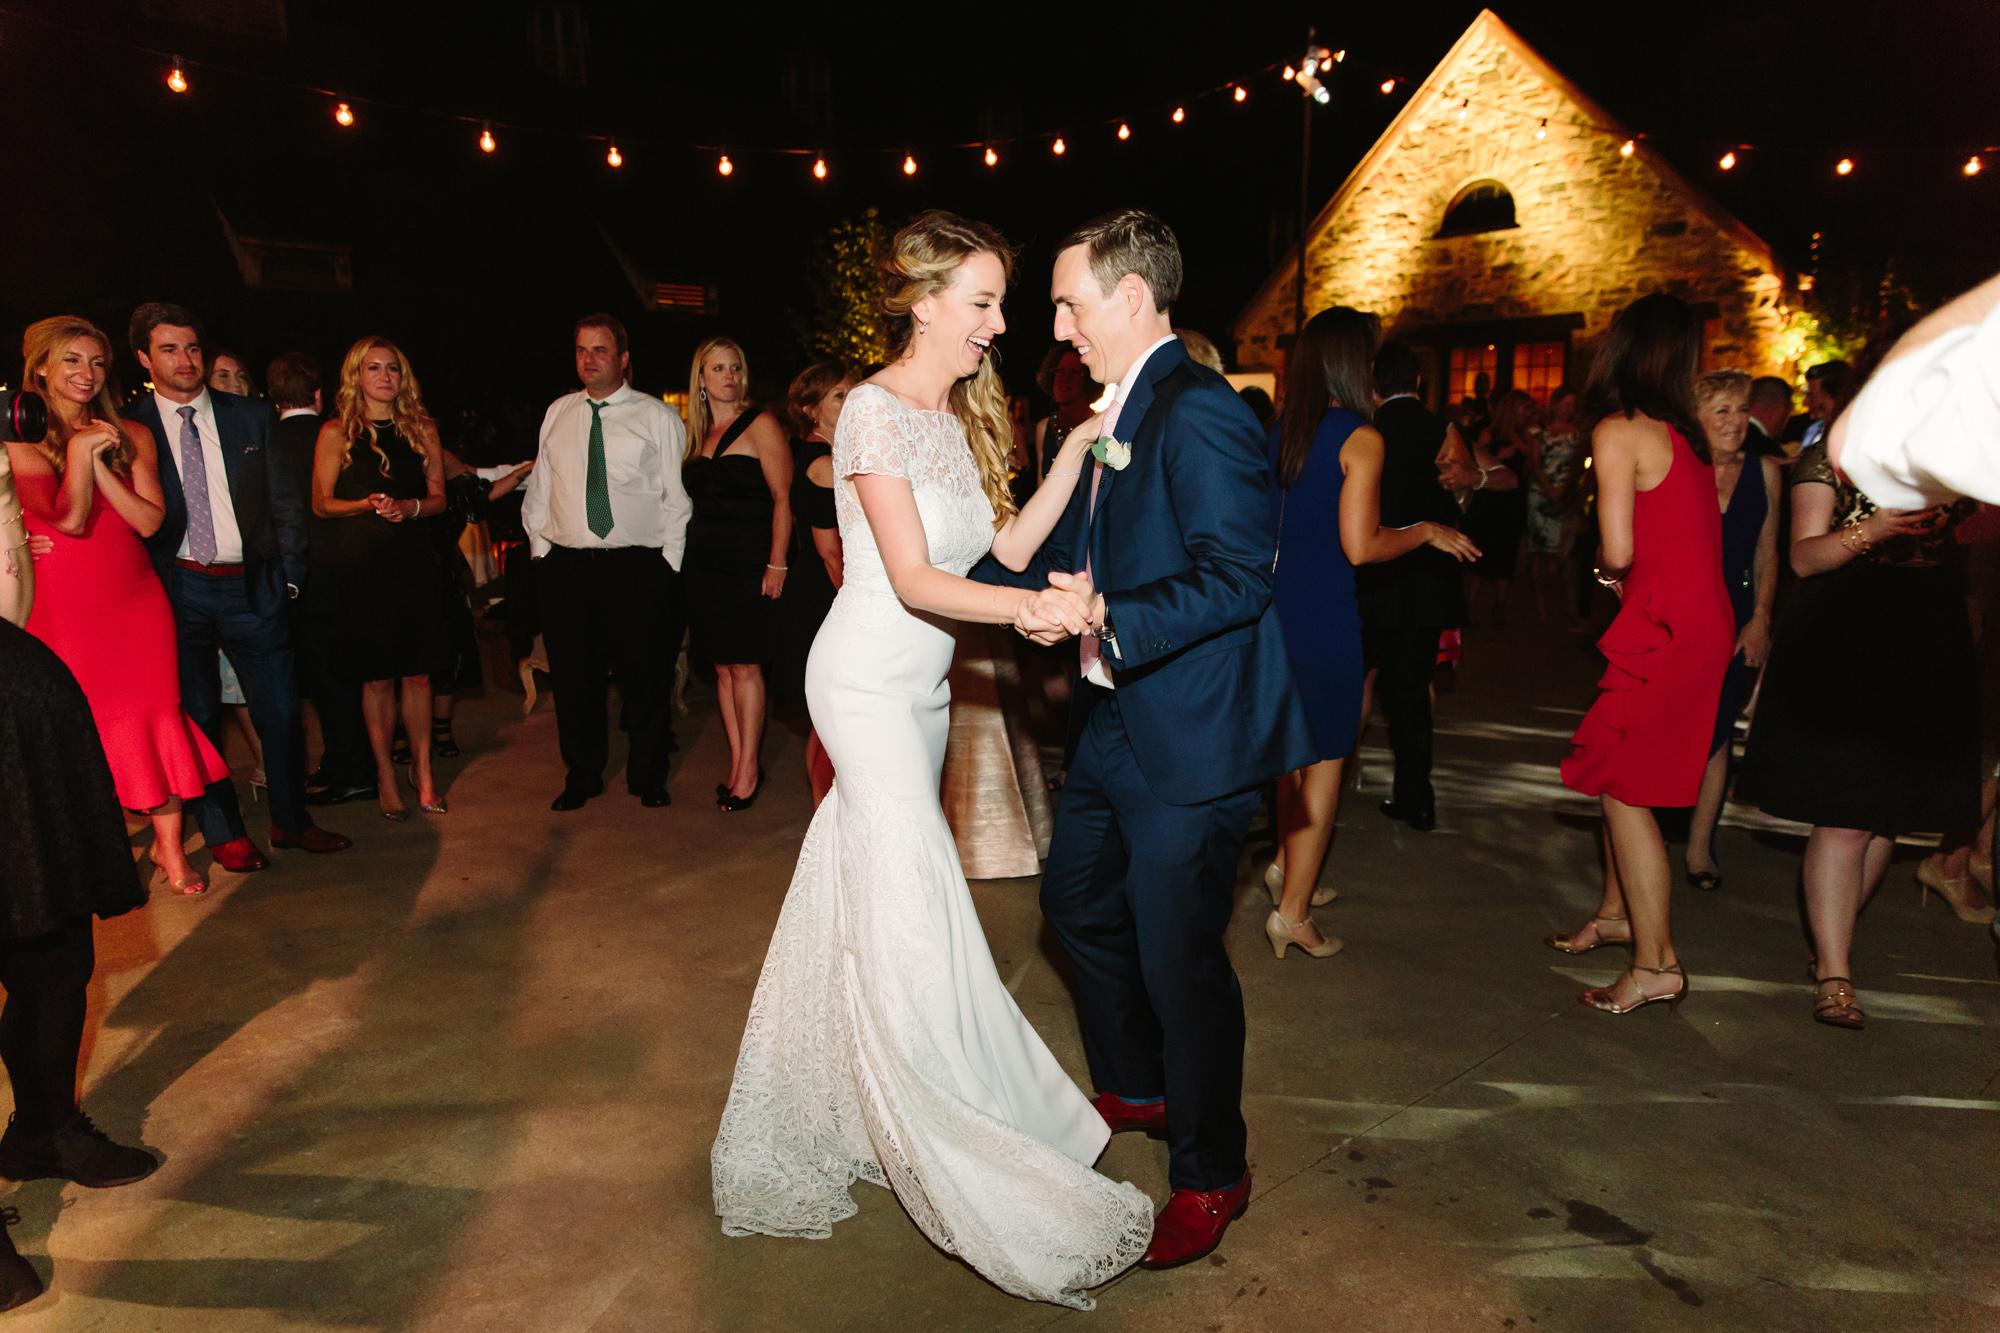 64_Jessica_Ted_Blue_Hill_Stone_Barns_Wedding_Pocantico_NY_Tanya_Salazar_Photography_192.jpg